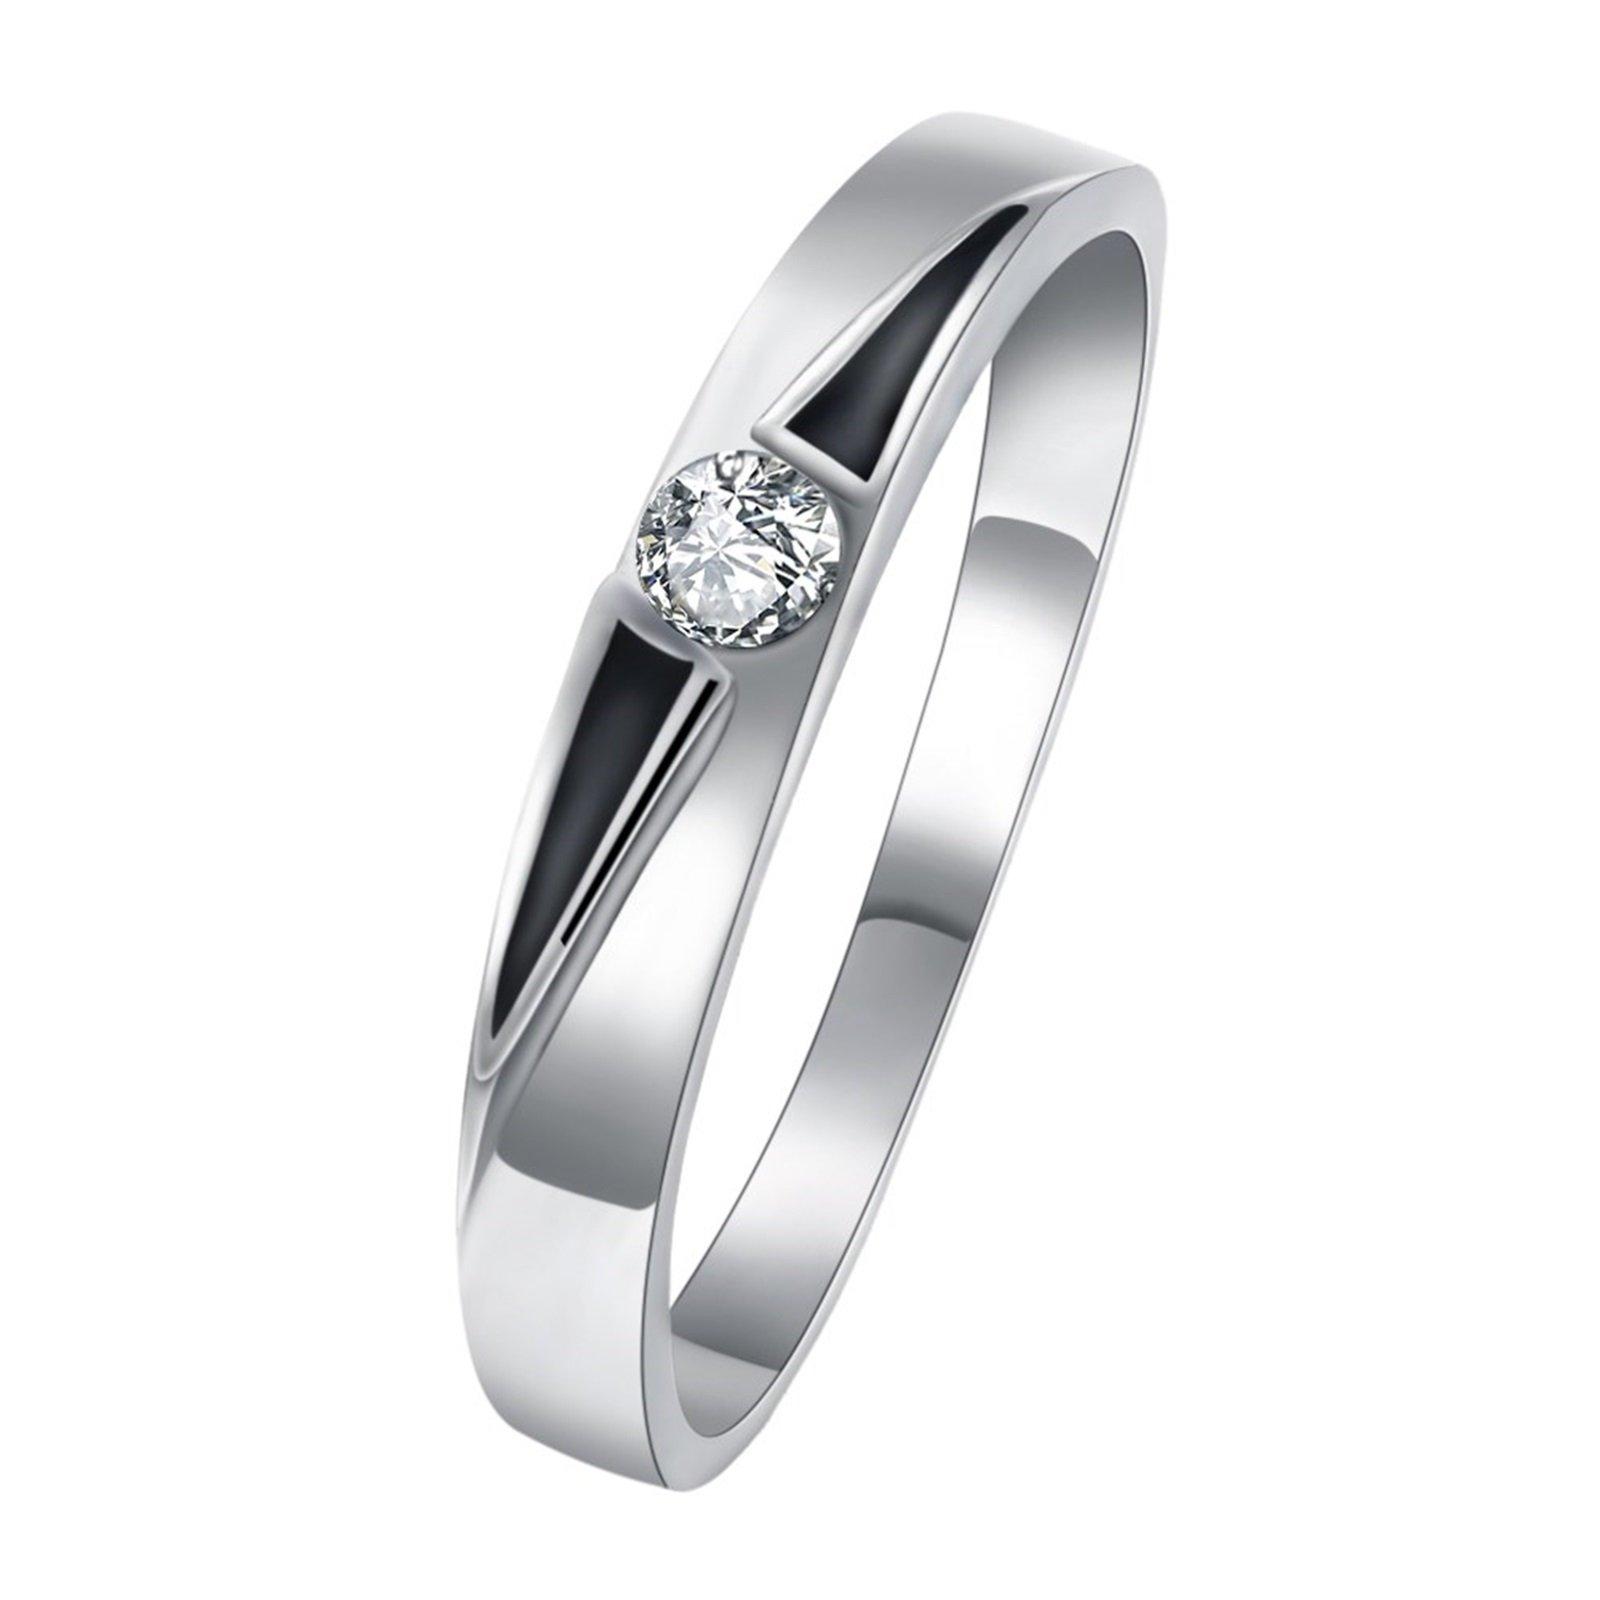 Epinki Women Round Cubic Zirconia Cz Diamond Eternity Engagement Wedding Band Ring Size 8 Men Accessories